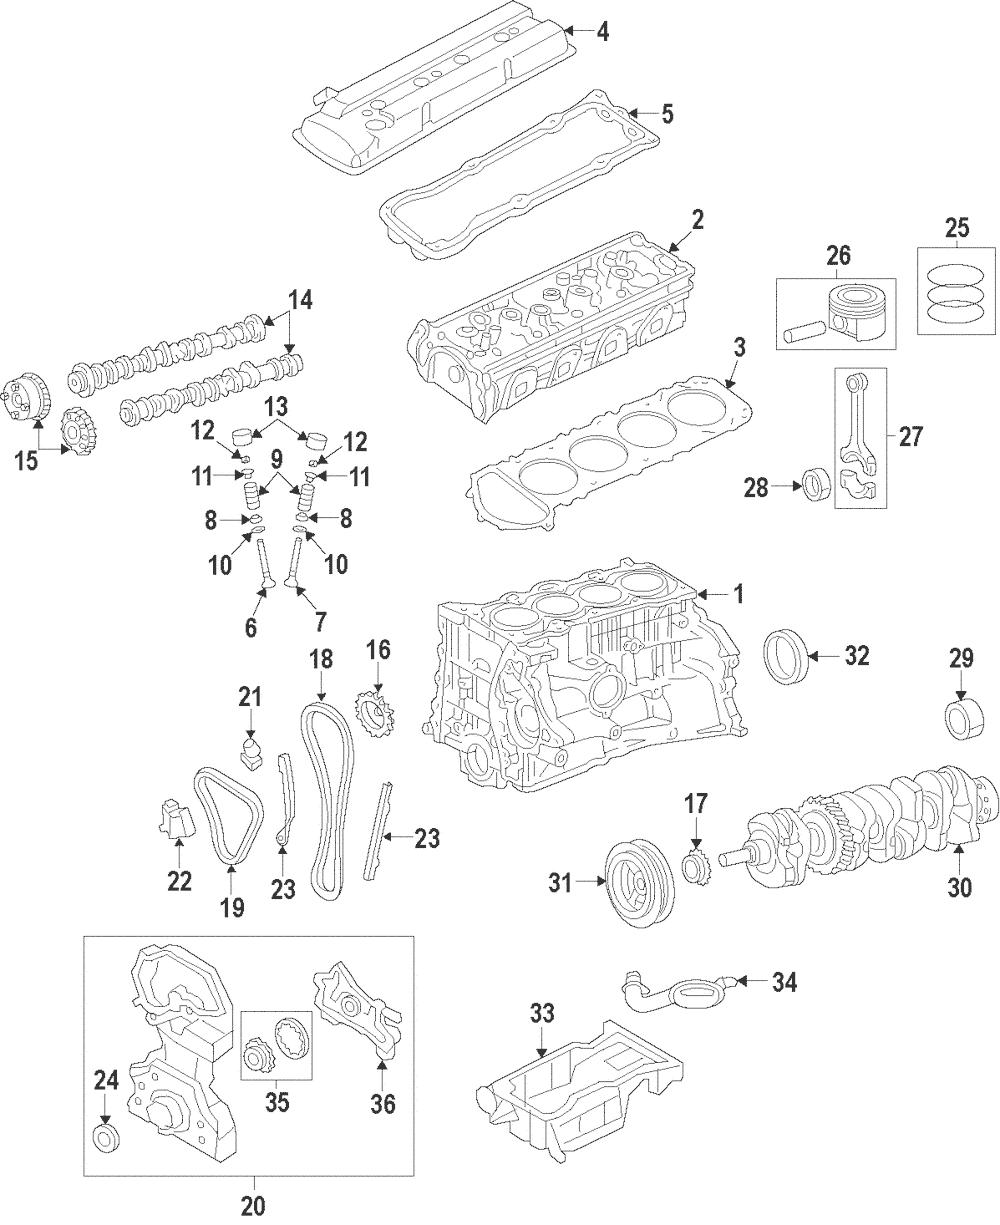 Main image genuine nissan parts